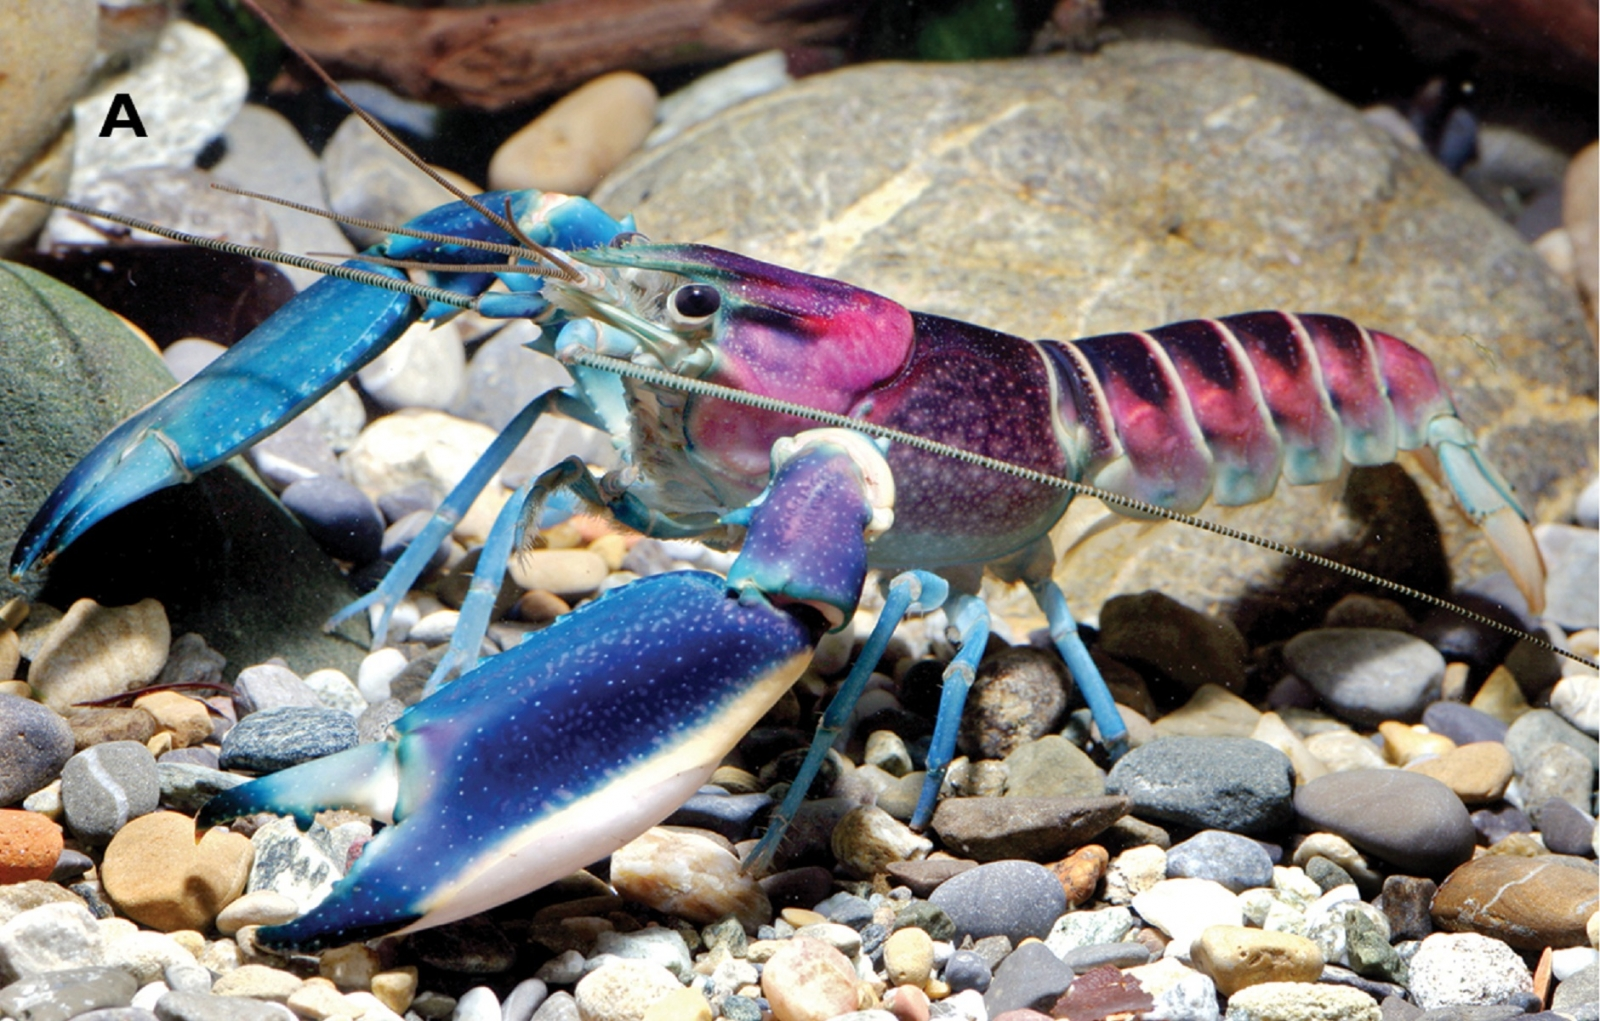 colourful new crayfish